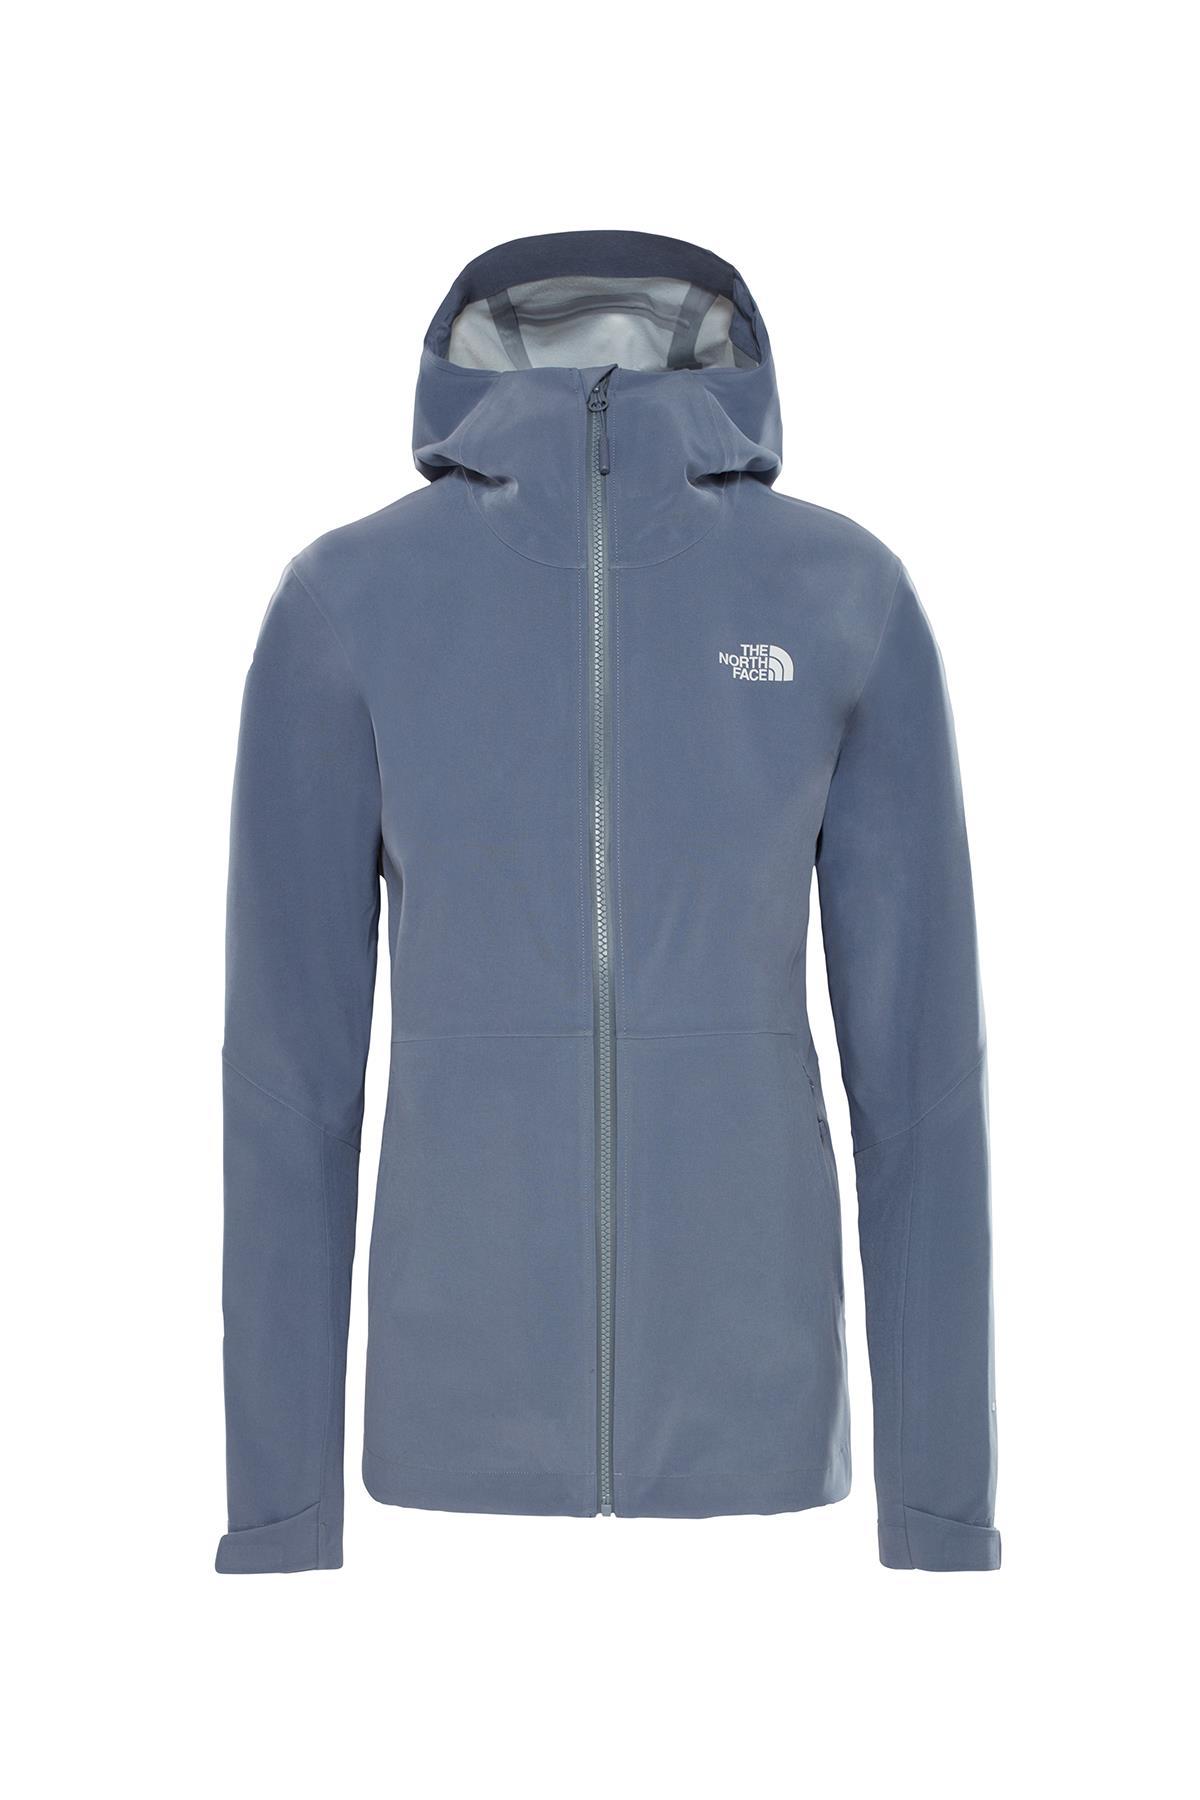 The Northface Kadın Apex Flex Dryvent Jacket T93Ry53Yh Ceket